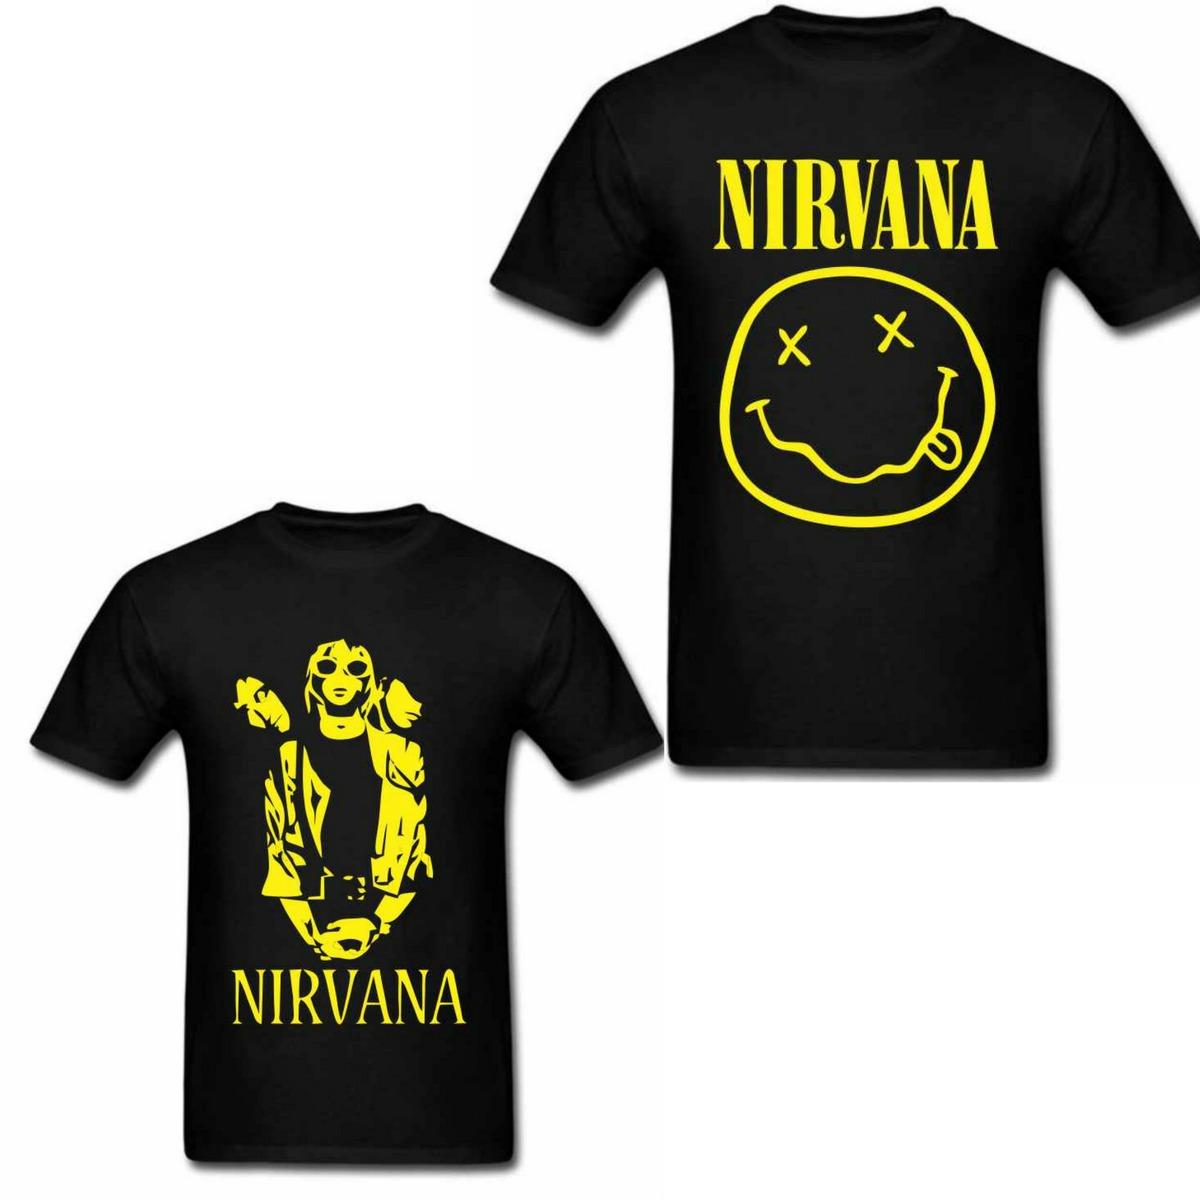 431d4e19db Camisa De Banda Nirvana Kurt Cobain Rock Roll Varias Opções - R  72 ...